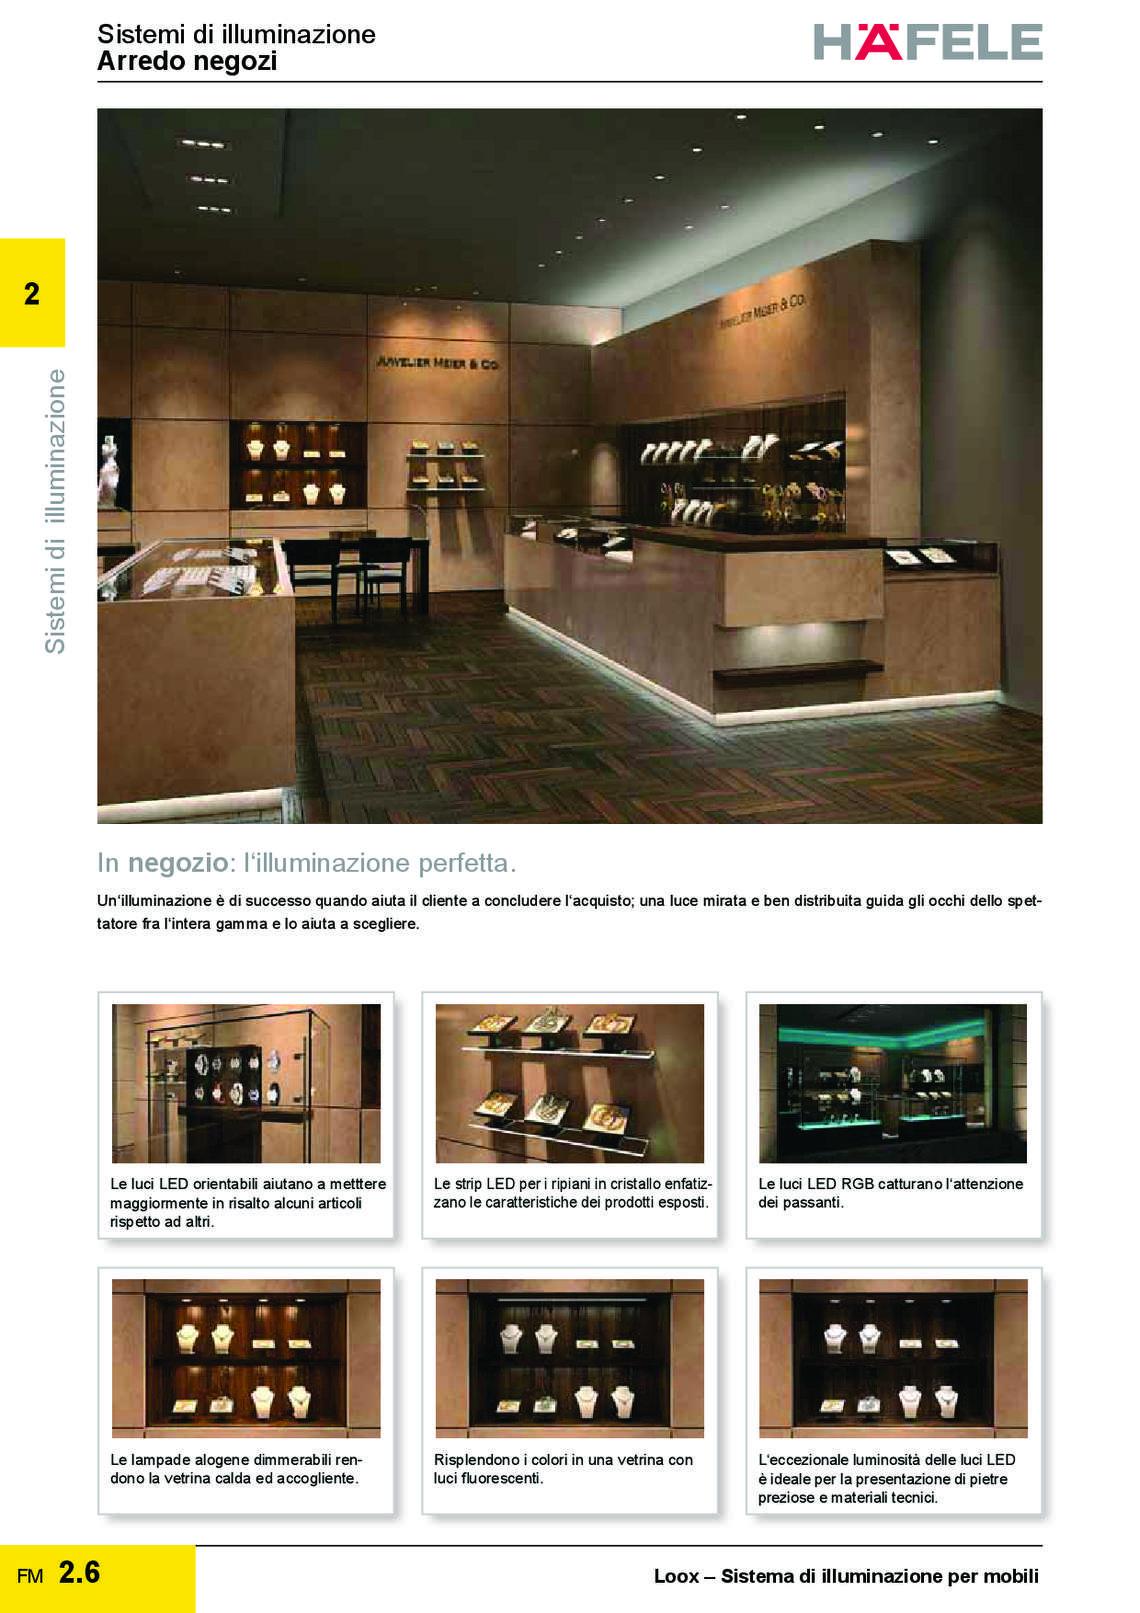 Catalogo hafele sistemi di illuminazione di h fele italia for Sistemi di illuminazione